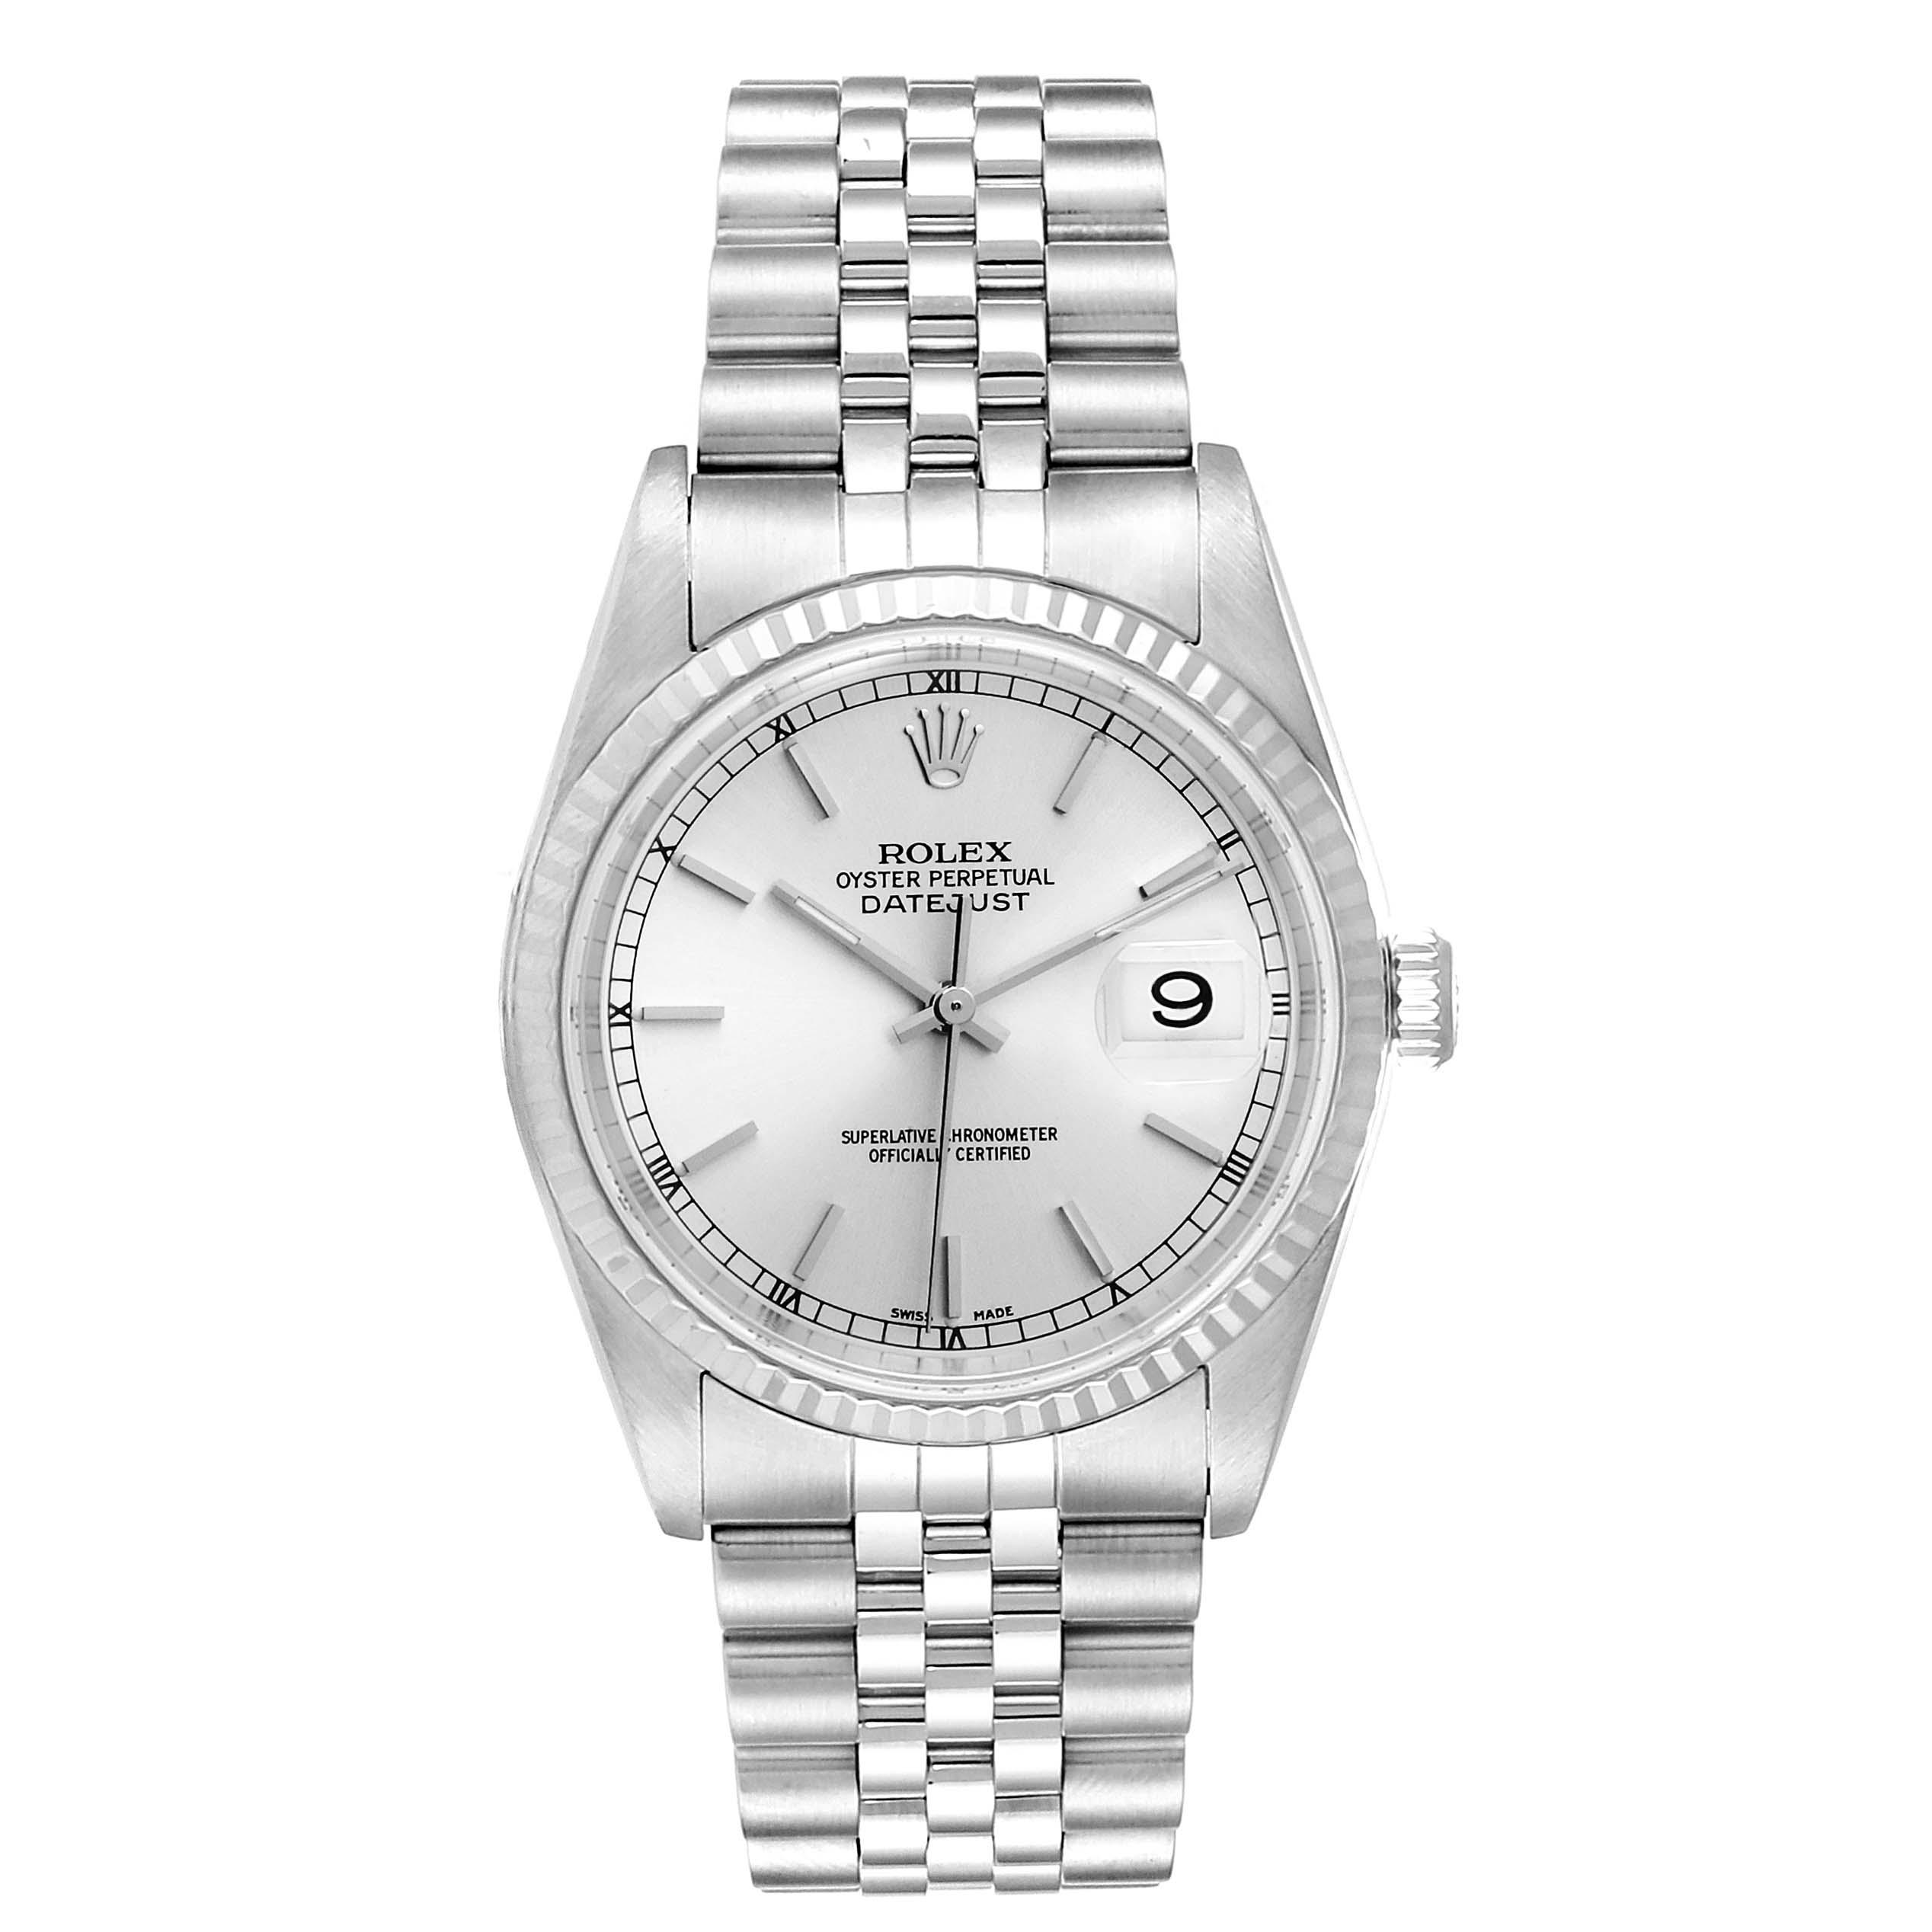 Rolex Datejust Steel White Gold Silver Baton Dial Mens Watch 16234 SwissWatchExpo